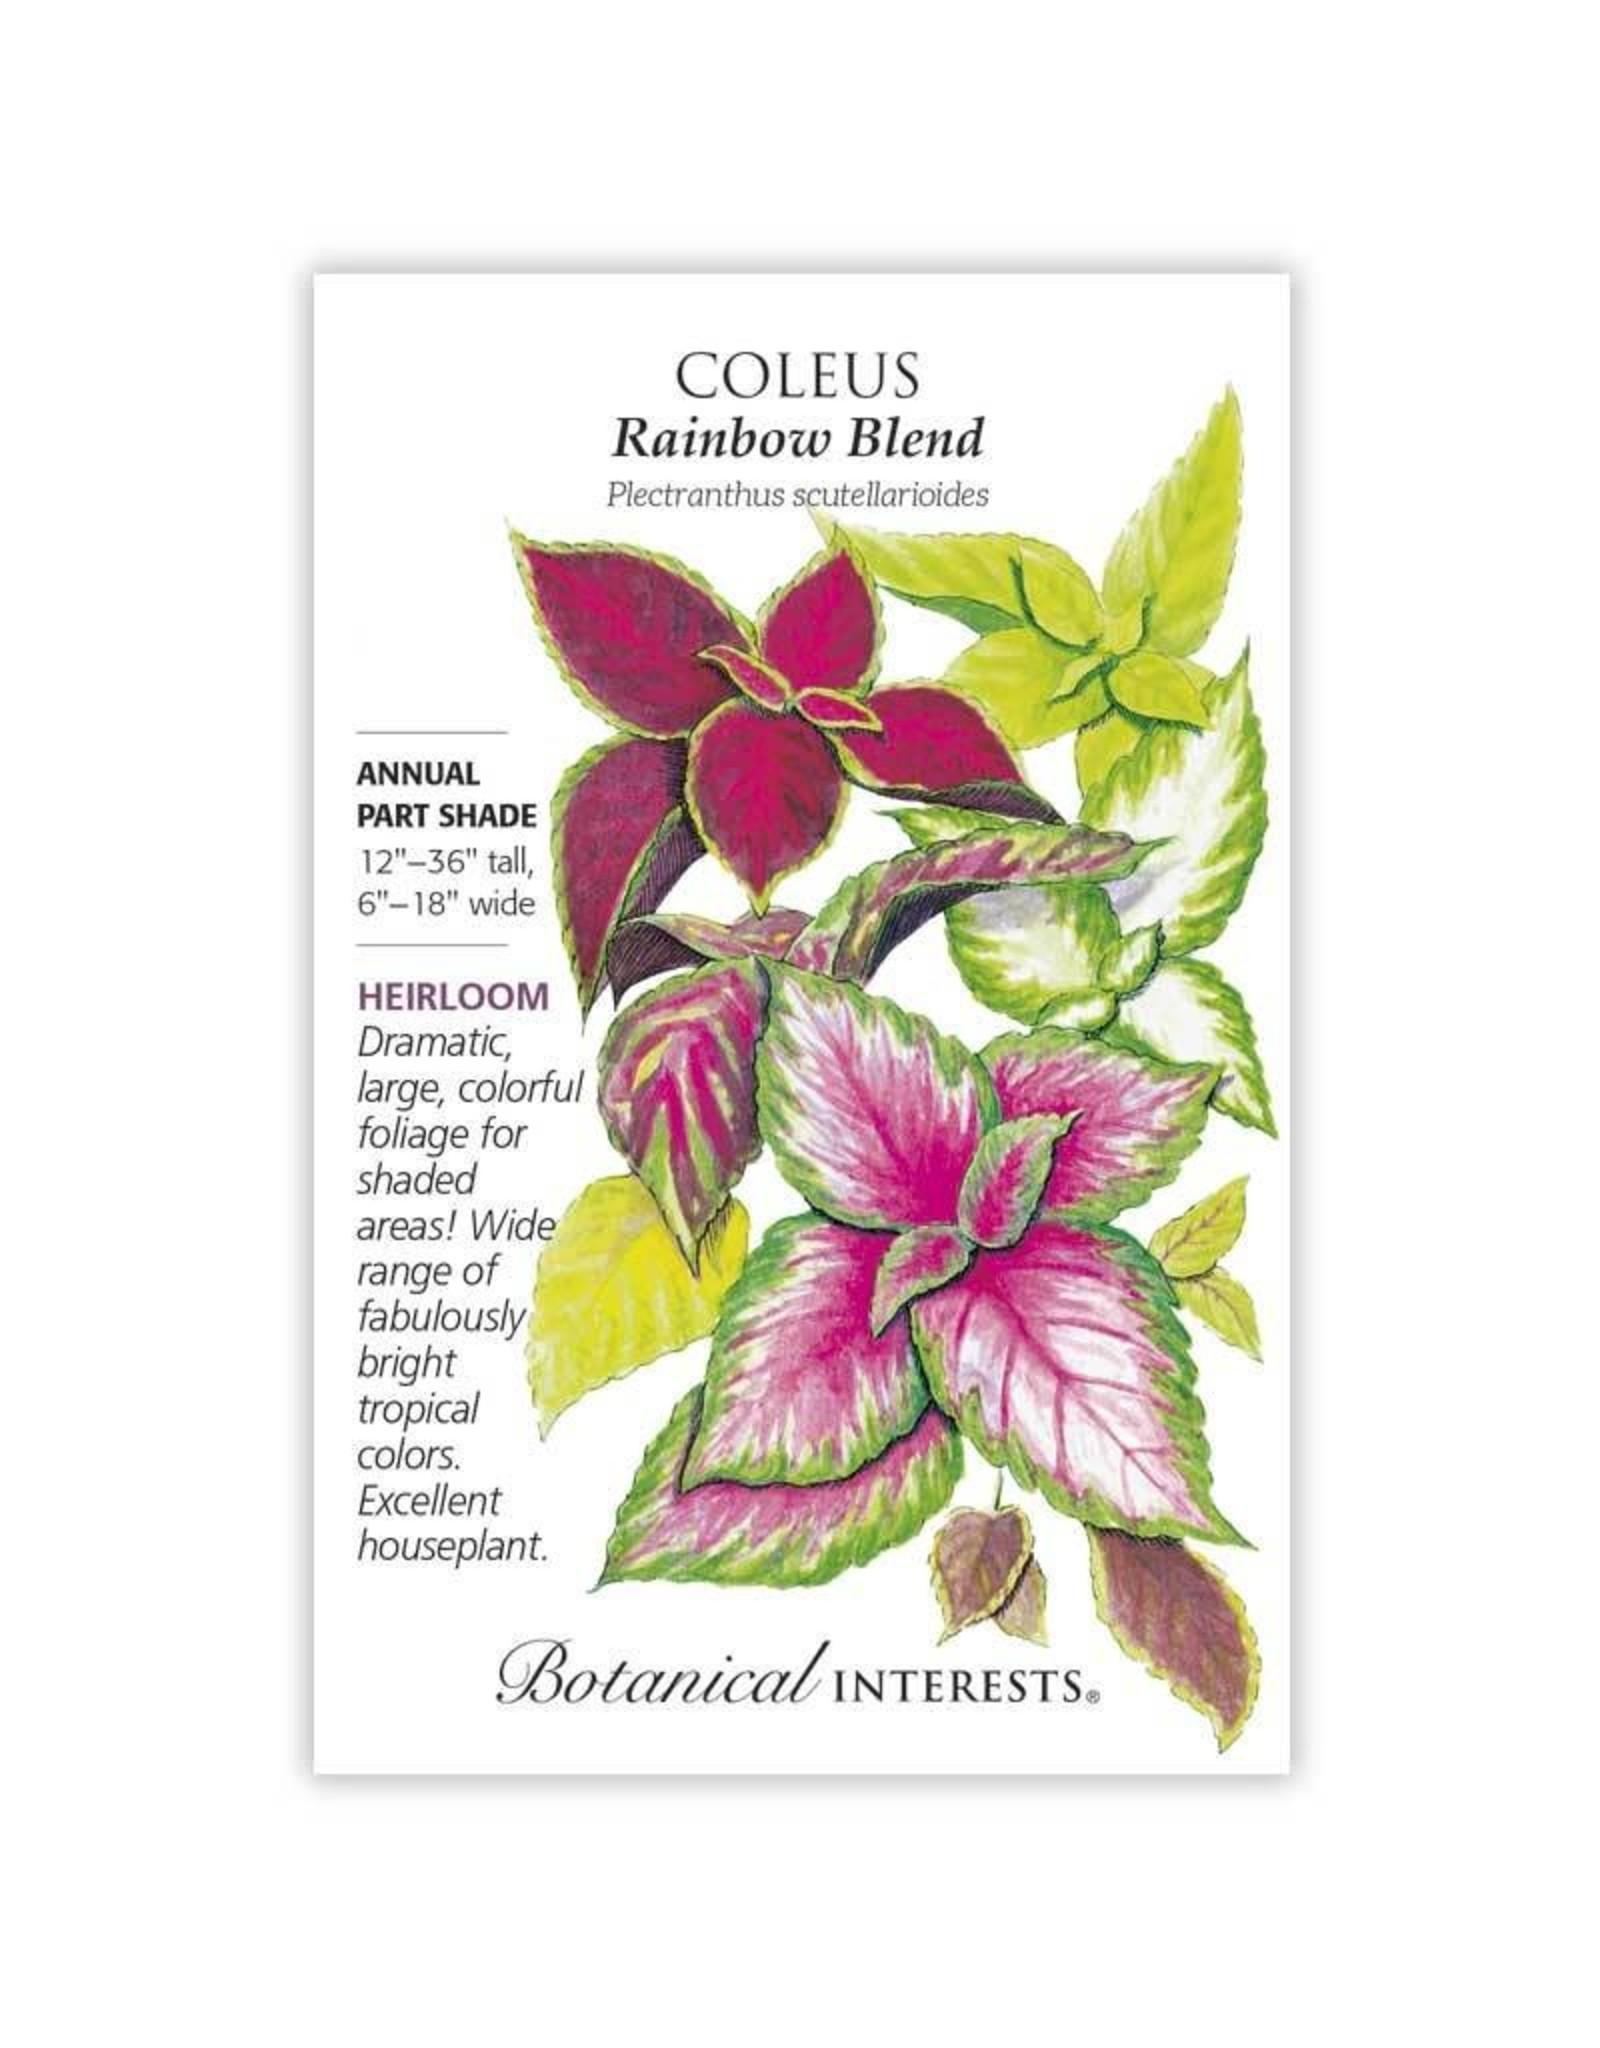 Seeds - Coleus Rainbow Blend